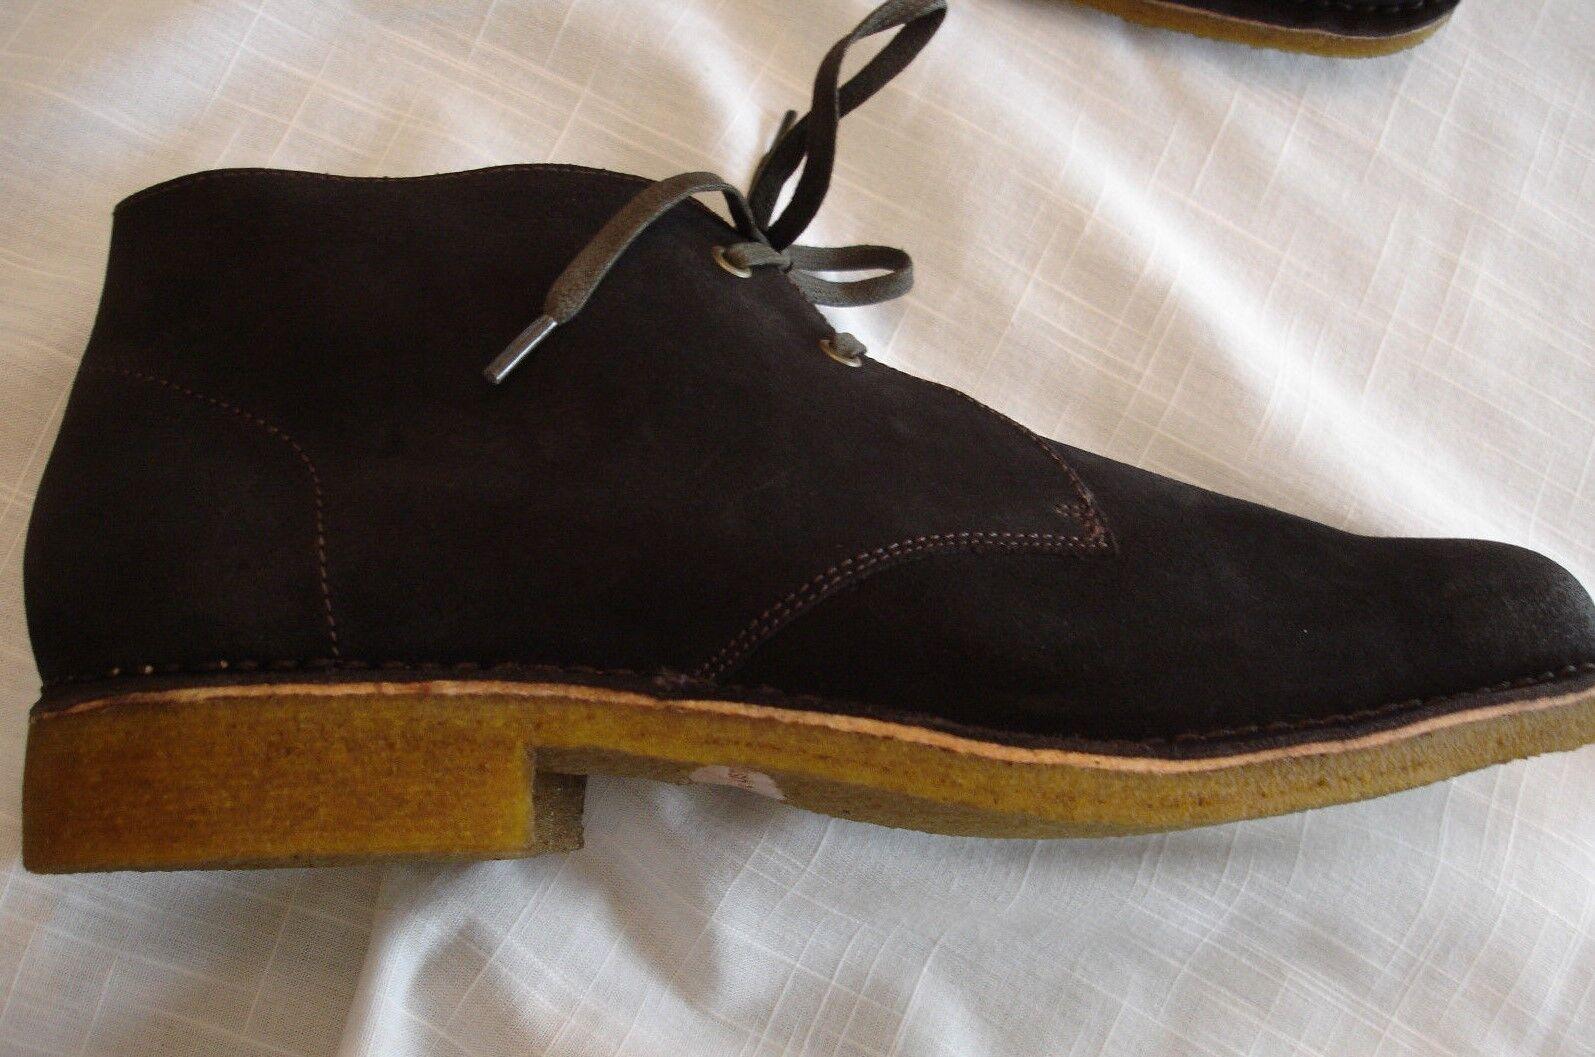 HUSH PUPPIES NORCO DK Marrón Gamuza Chukka Botín Zapatos para hombre M Nuevo en Caja